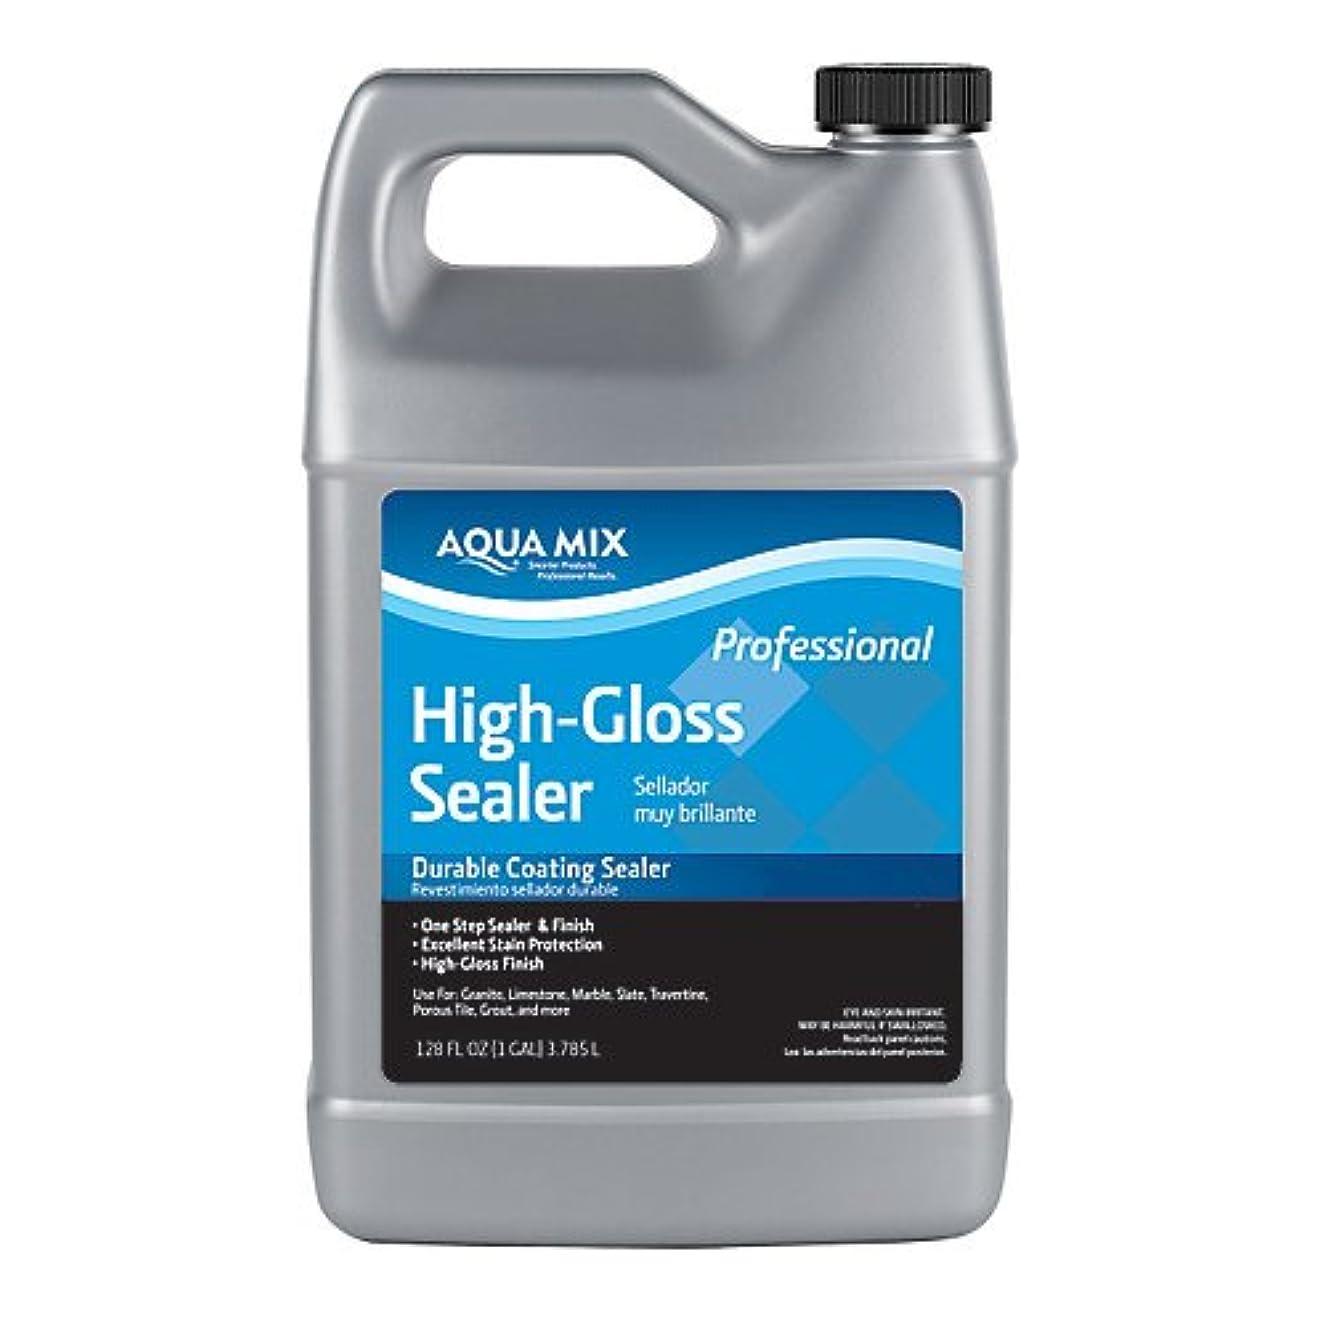 Aqua Mix High Gloss Sealer Durable Coating Sealer 1 Gallon